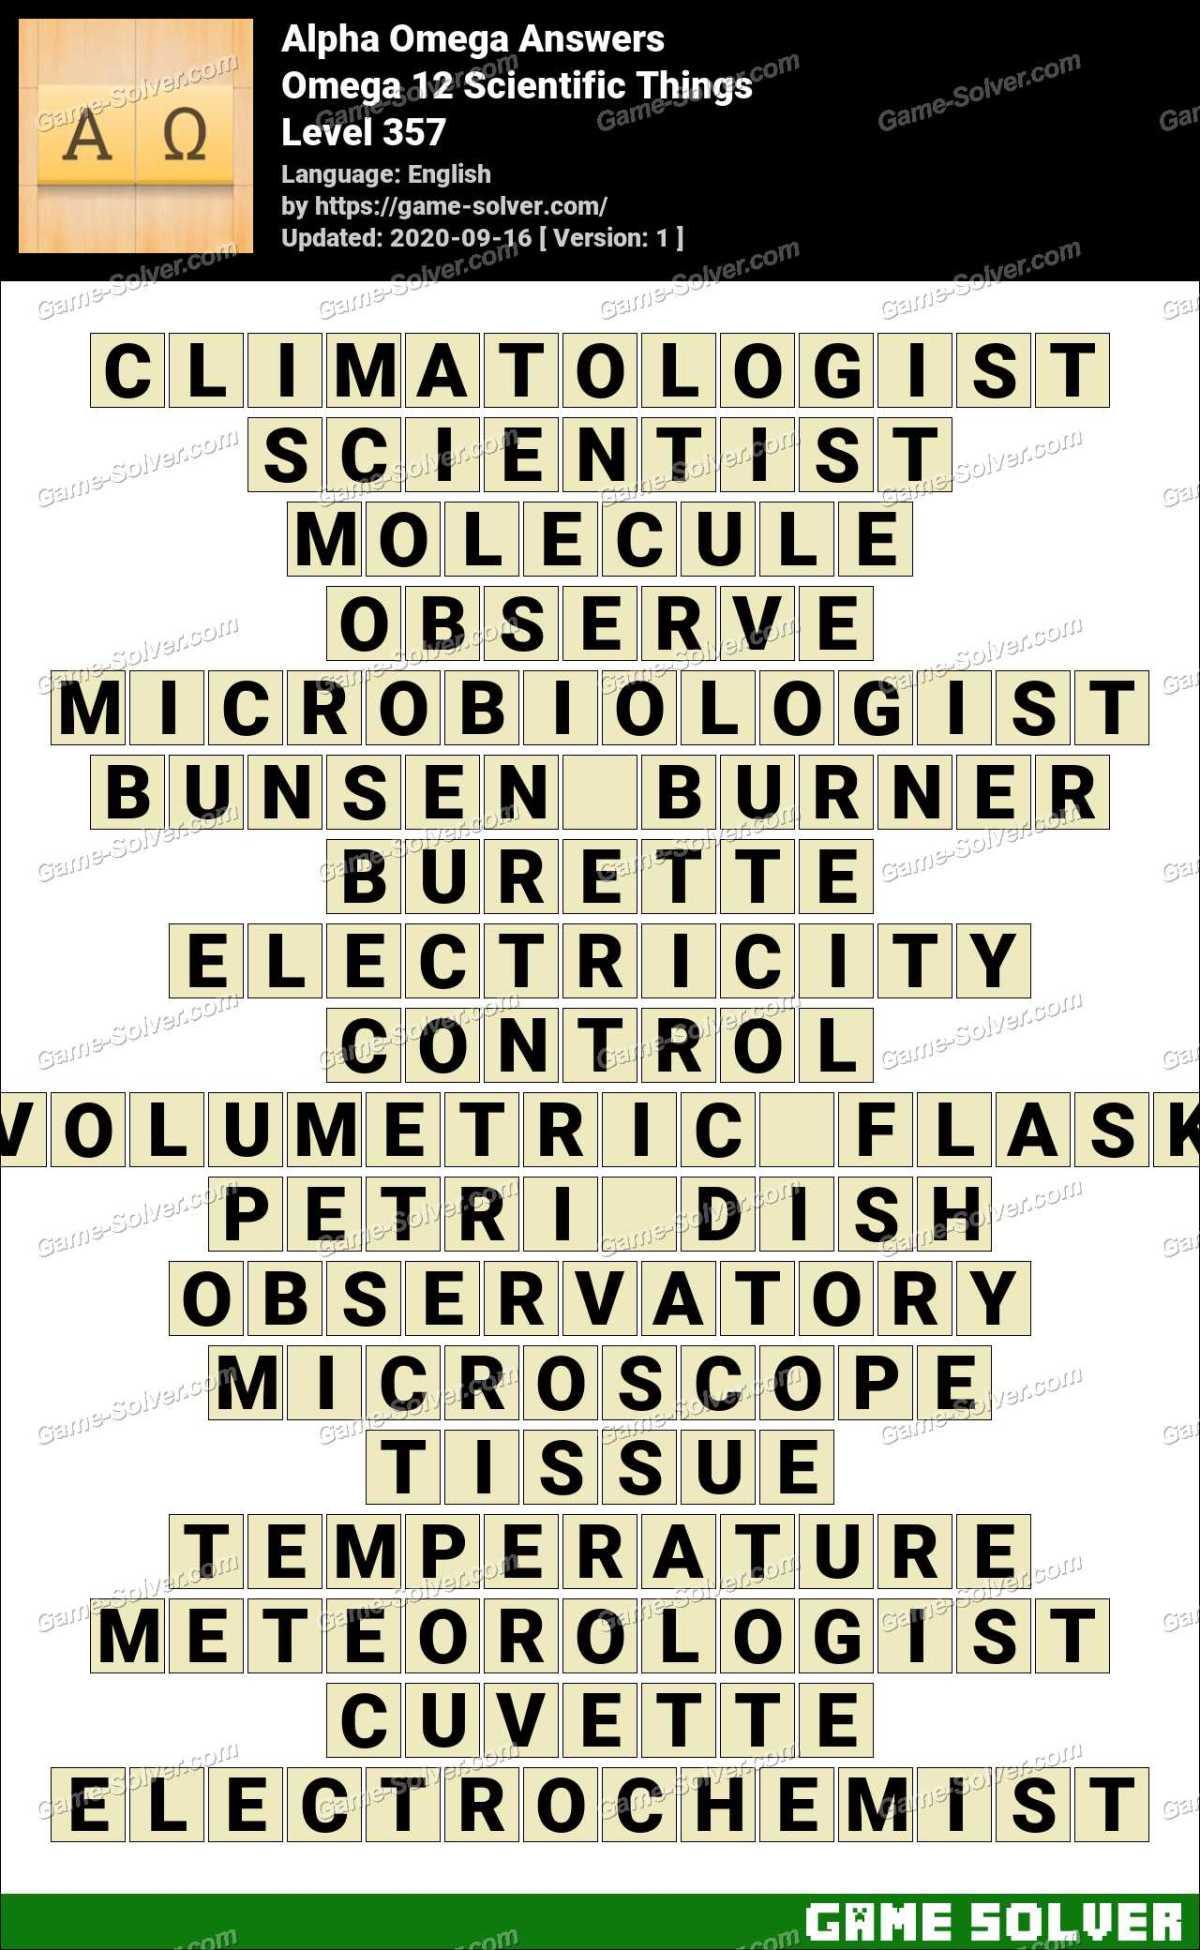 Alpha Omega Omega 12 Scientific Things